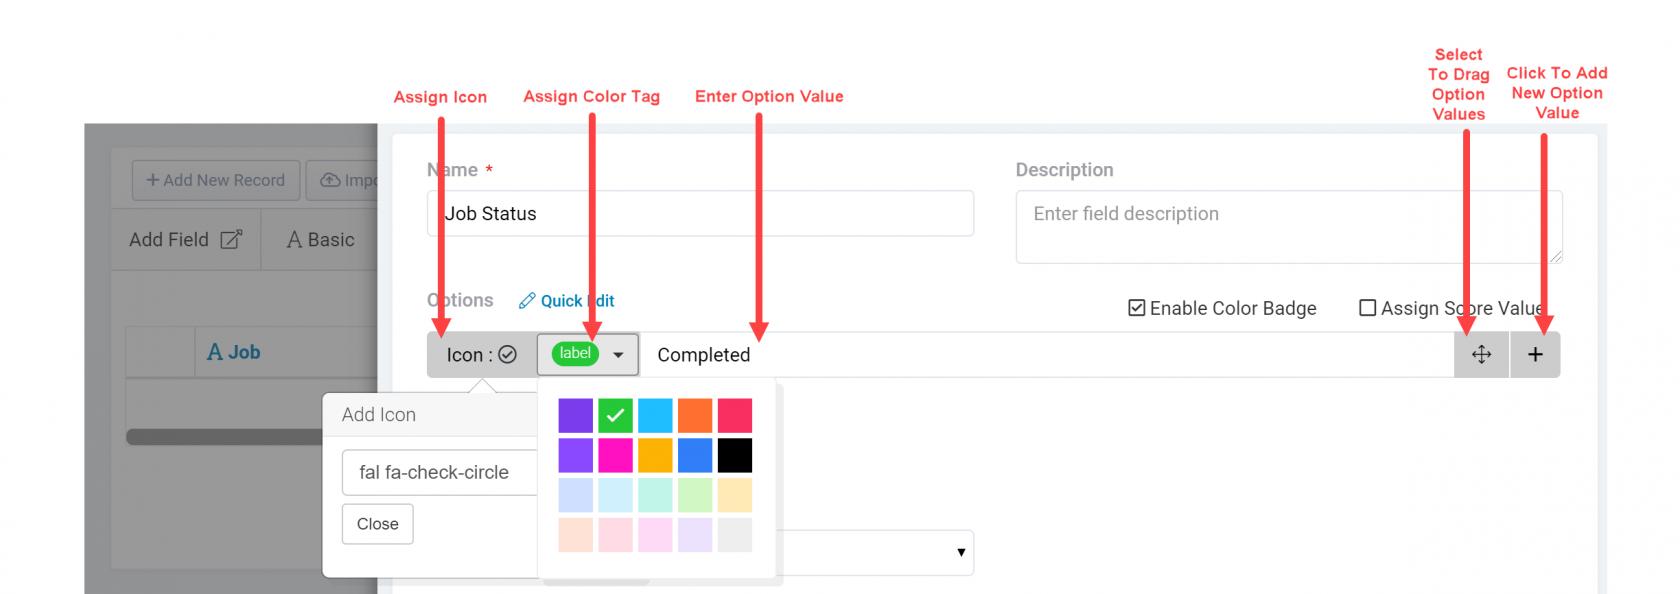 enter-option-values.png